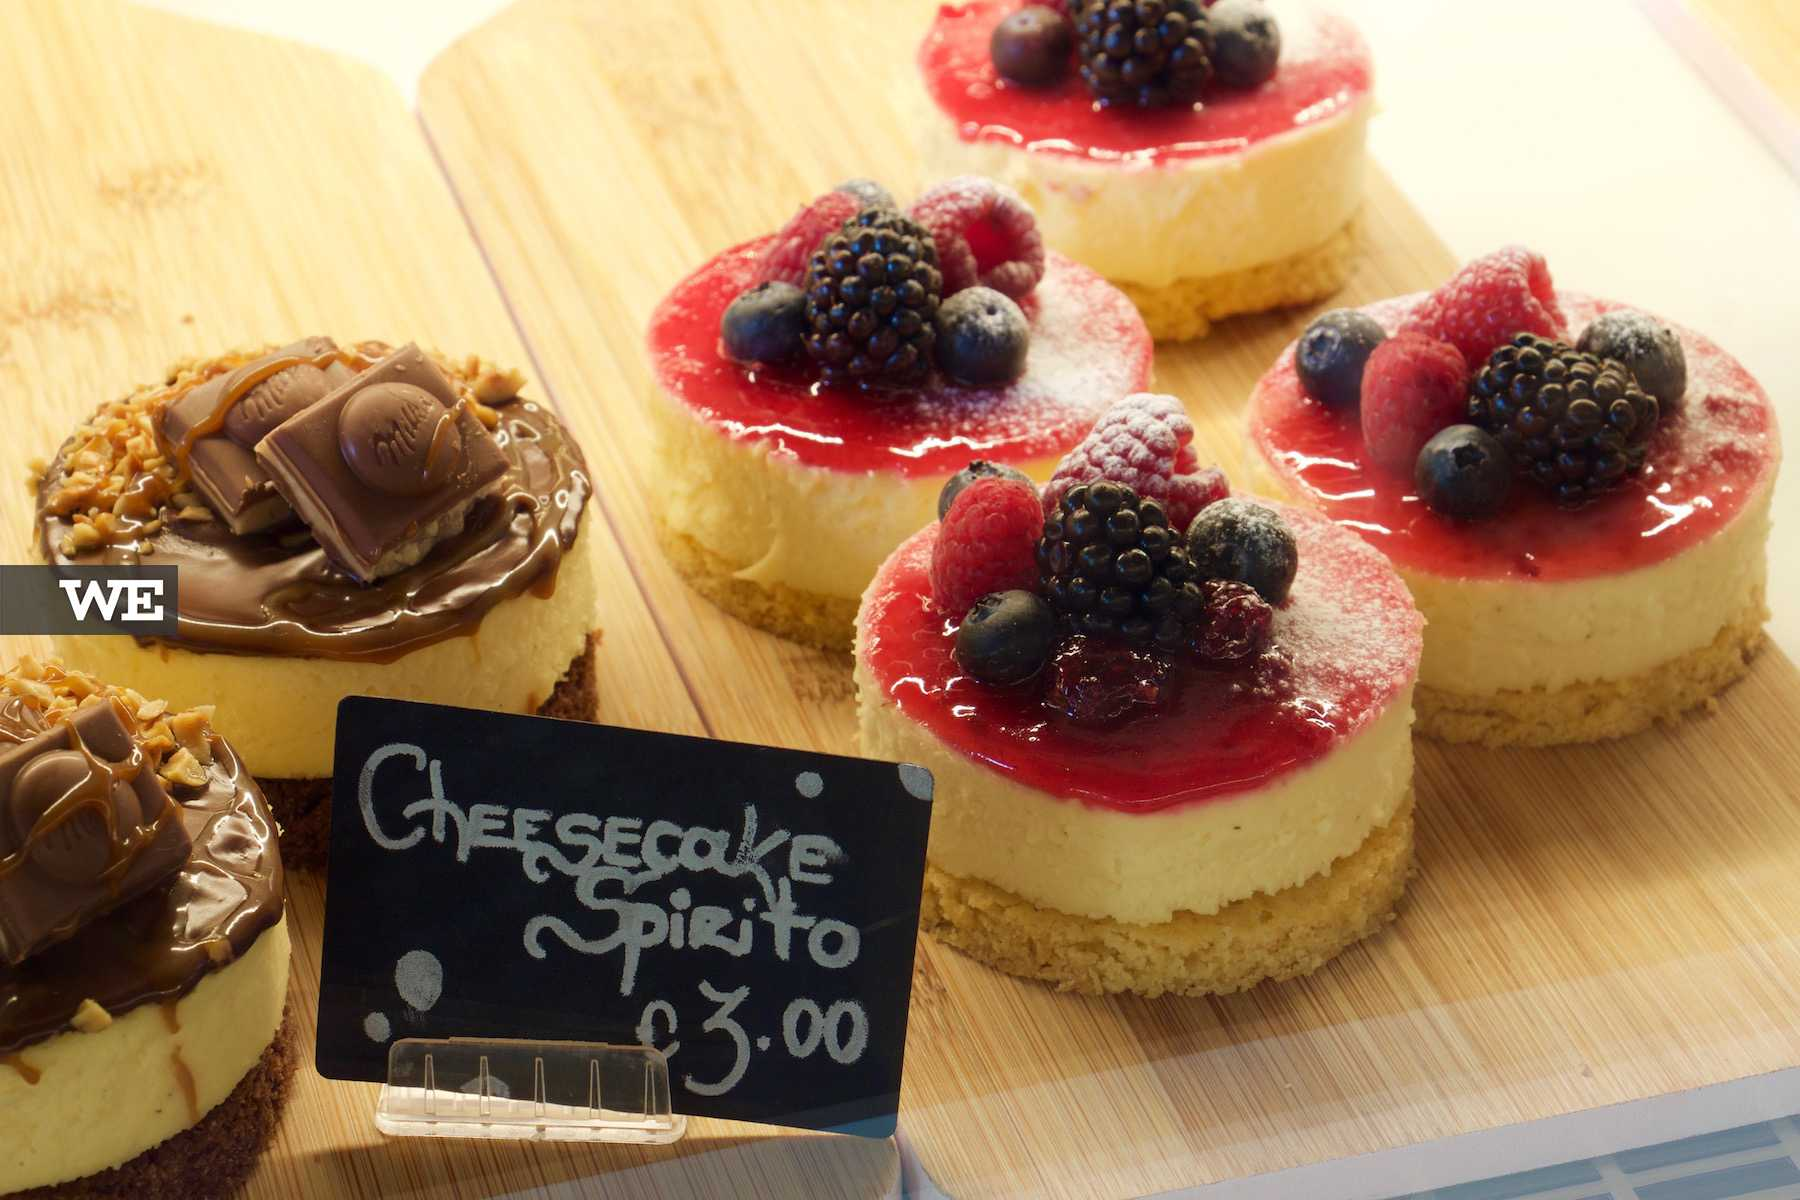 we-braga-spirito-cupcakes-